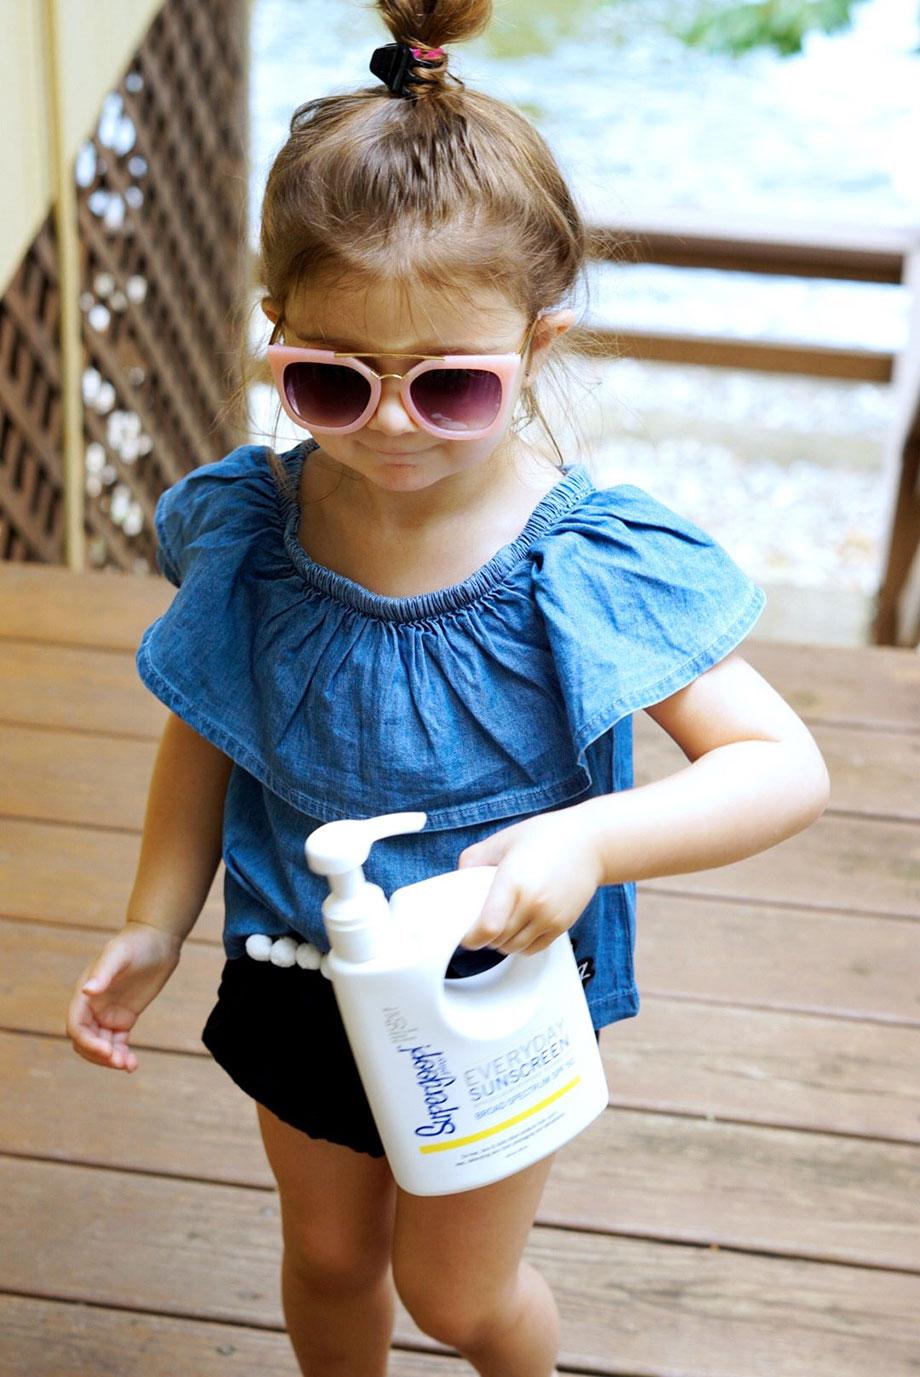 A little girl wearing sunglasses carries SuperGoop sunscreen lotion.